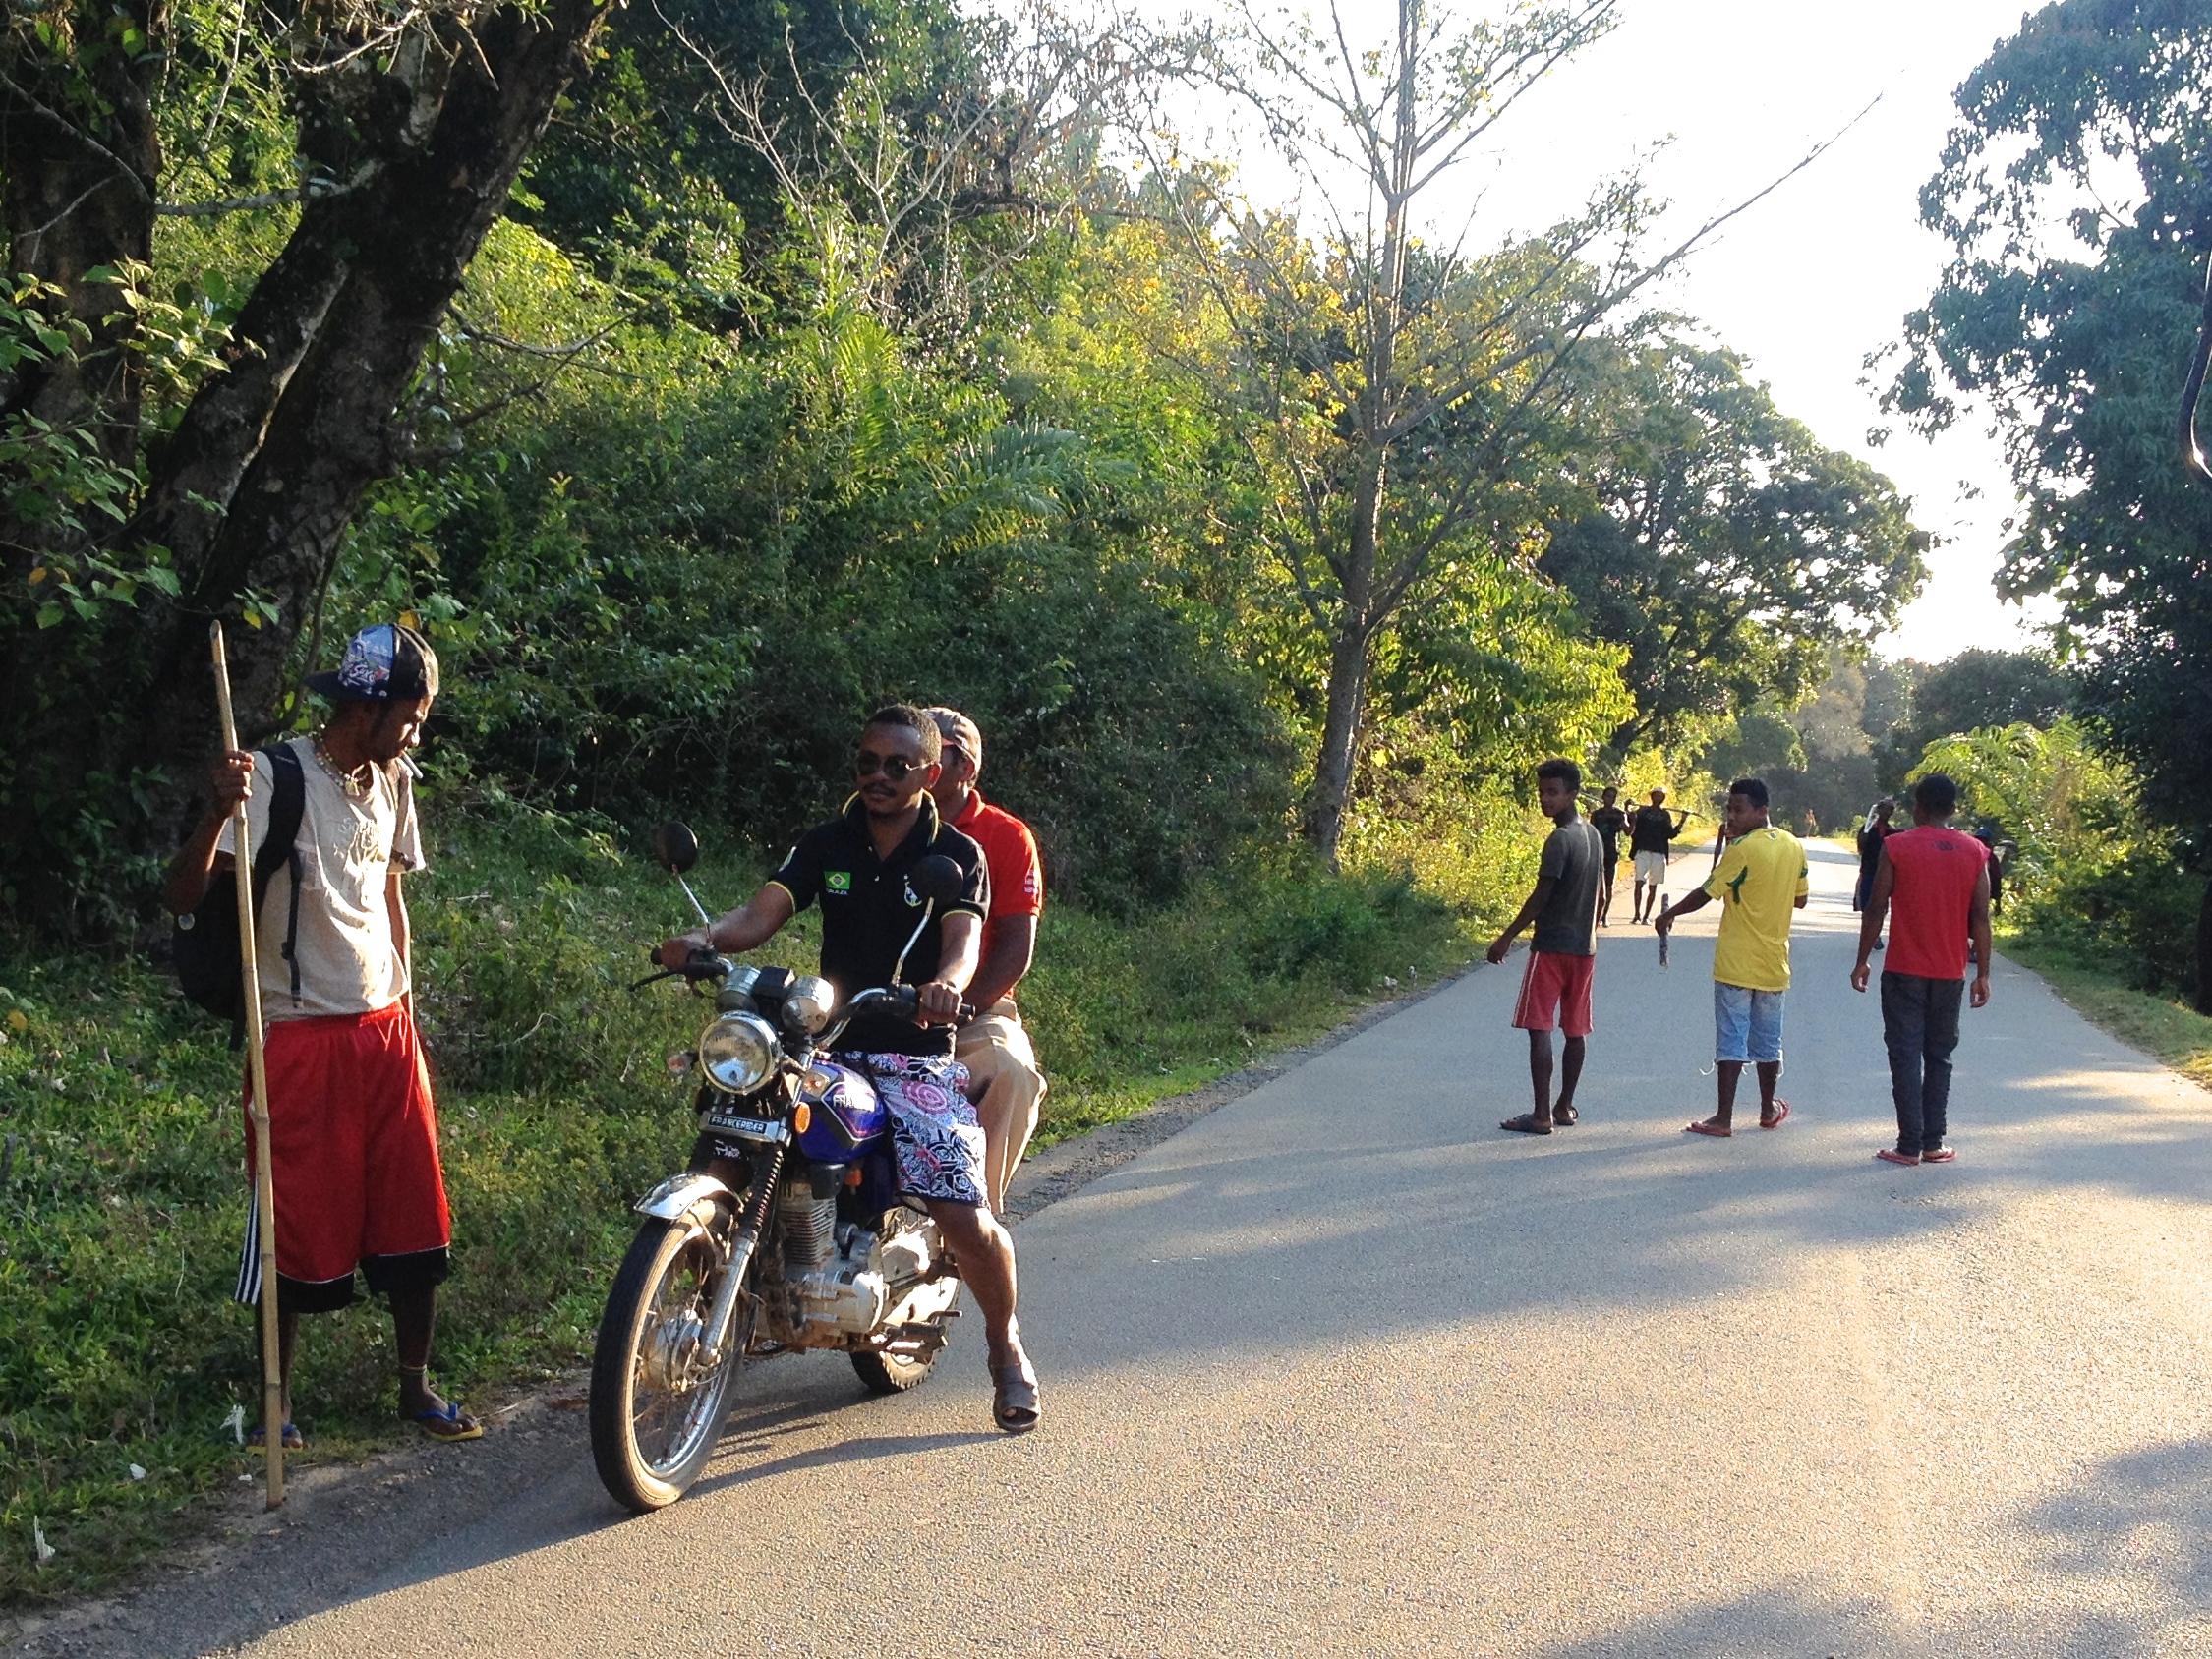 Motorbike – alternative travel around the commune.